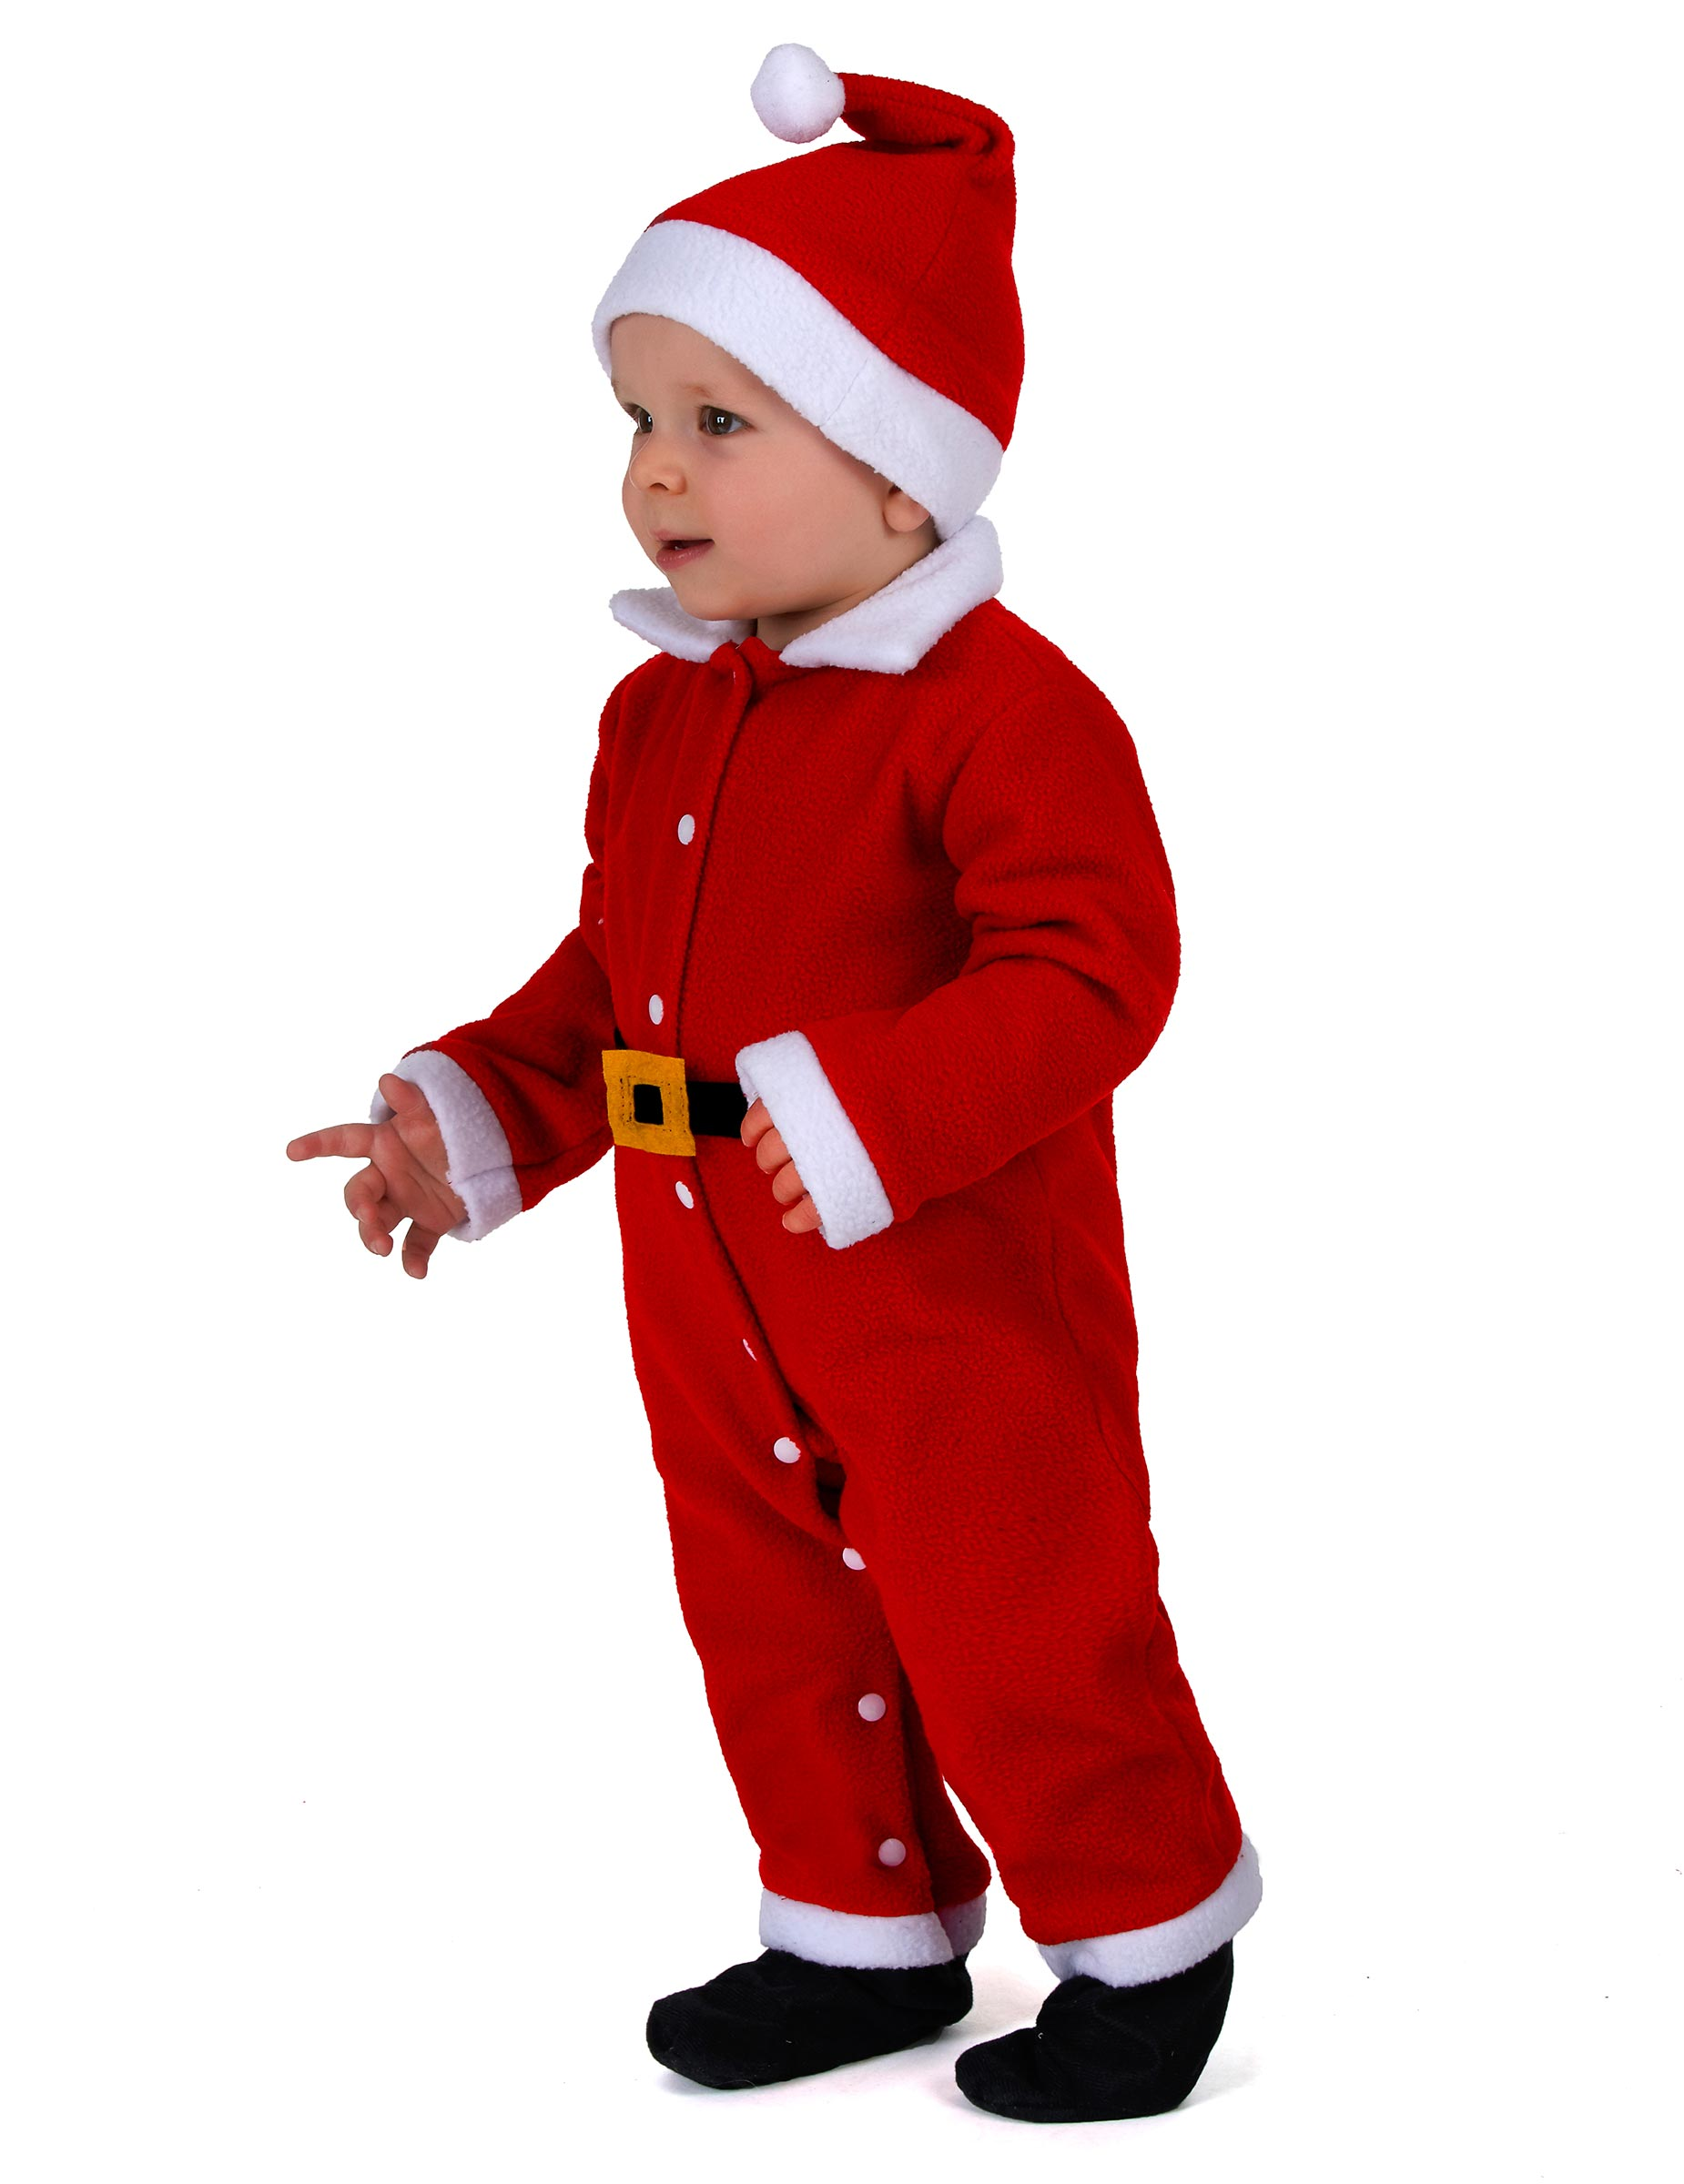 weihnachtsmann kost m f r babys kost me f r kinder und. Black Bedroom Furniture Sets. Home Design Ideas